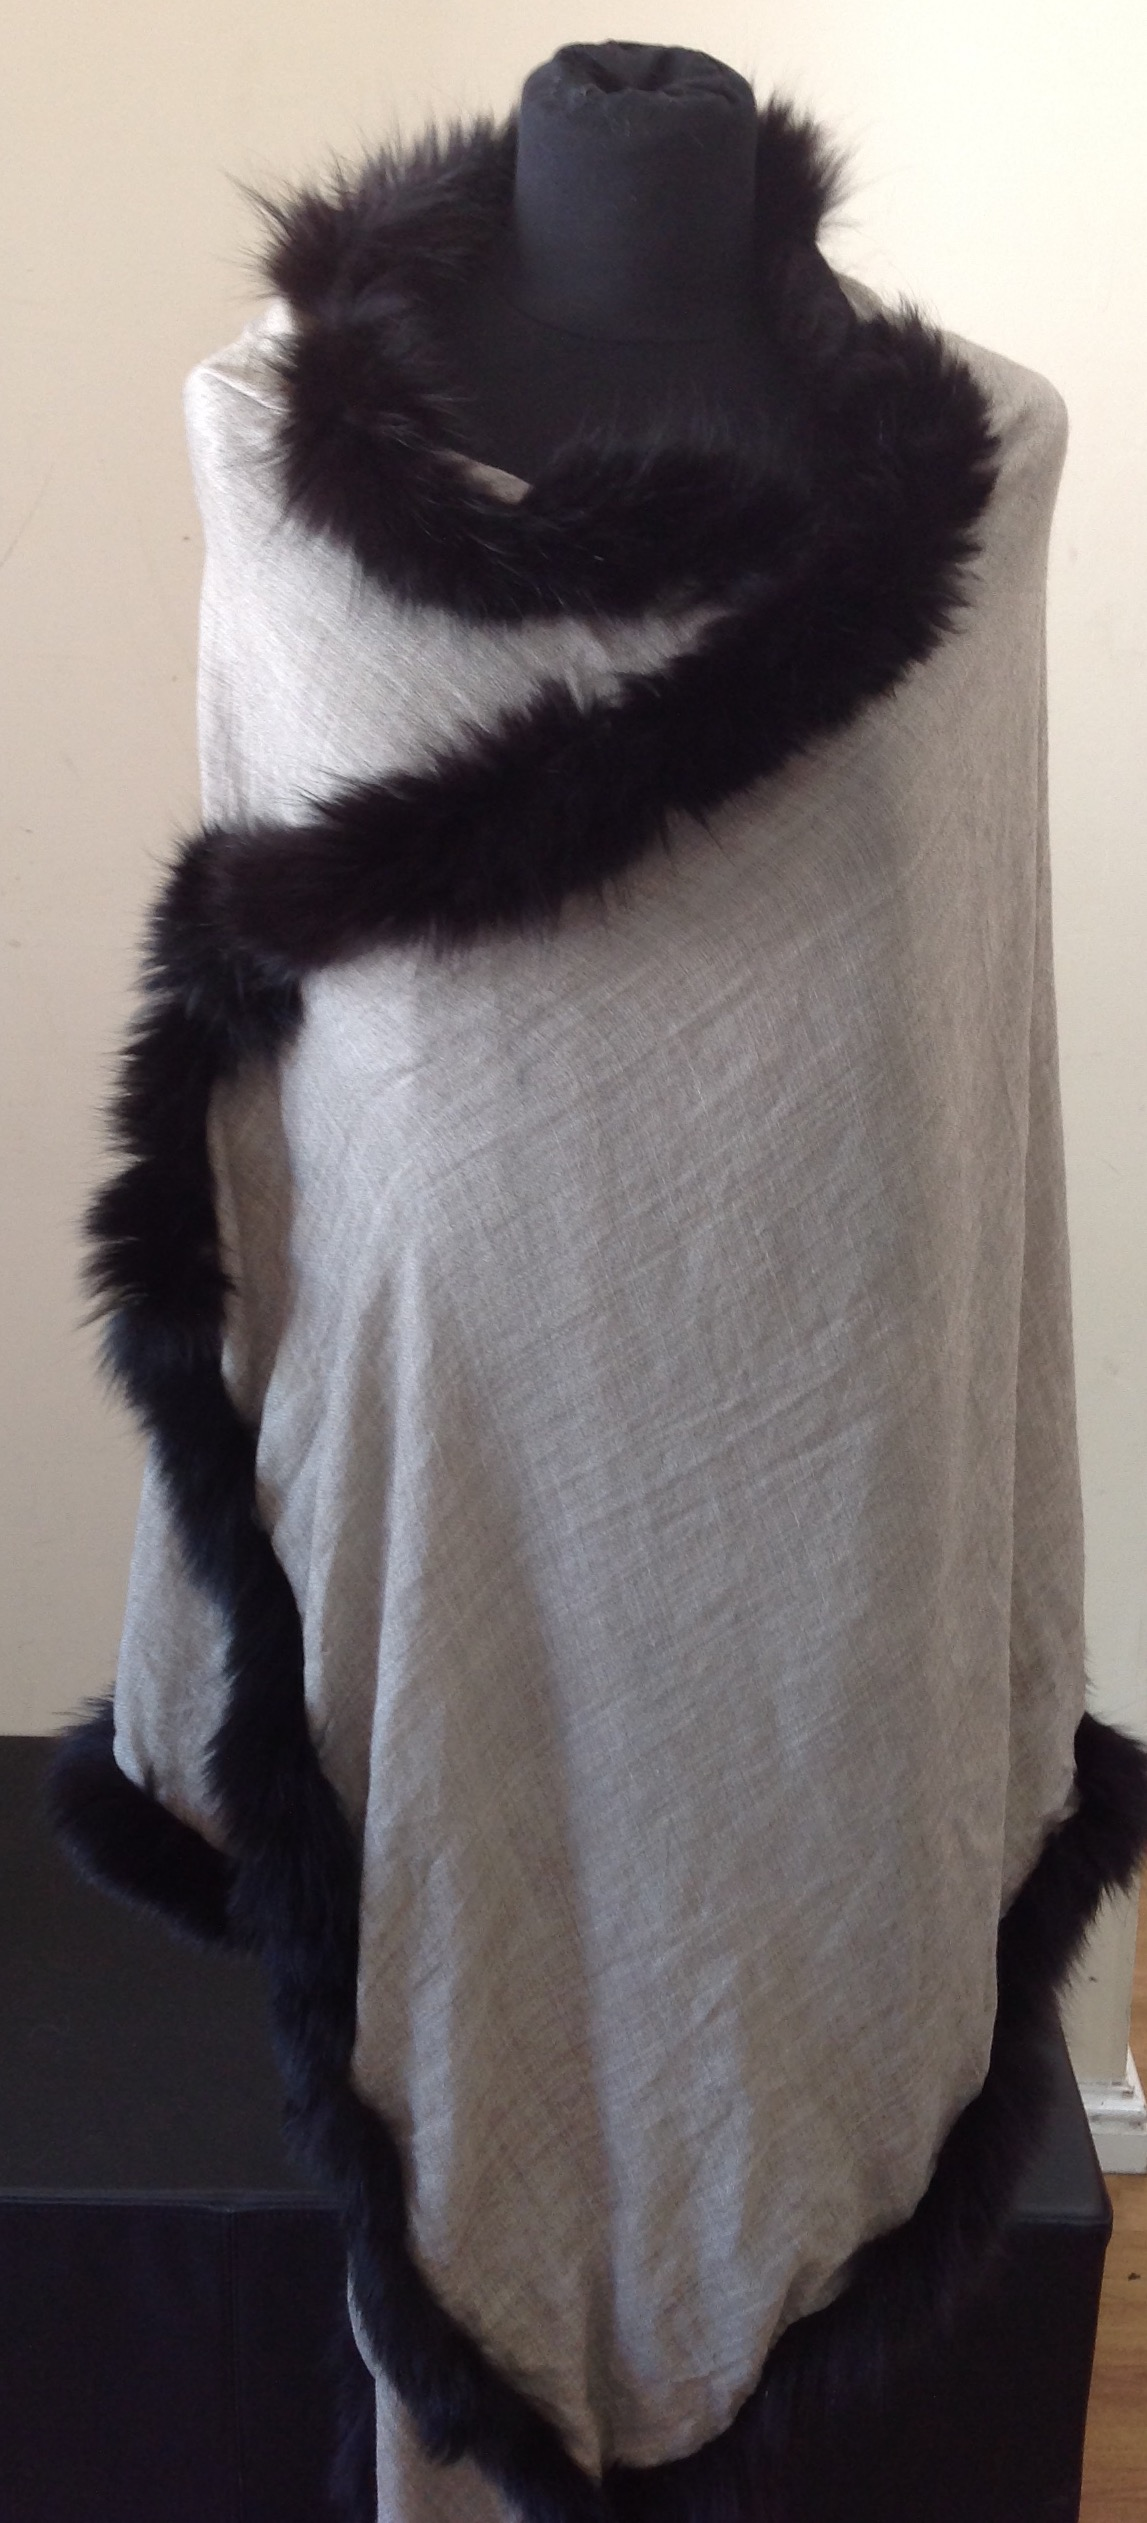 Job Lot Of Scarves 2 Black & 2 Navy With Fur Pom Poms , 1 Grey With Black Fur Trim & 1 Grey With Fur Grey Trim